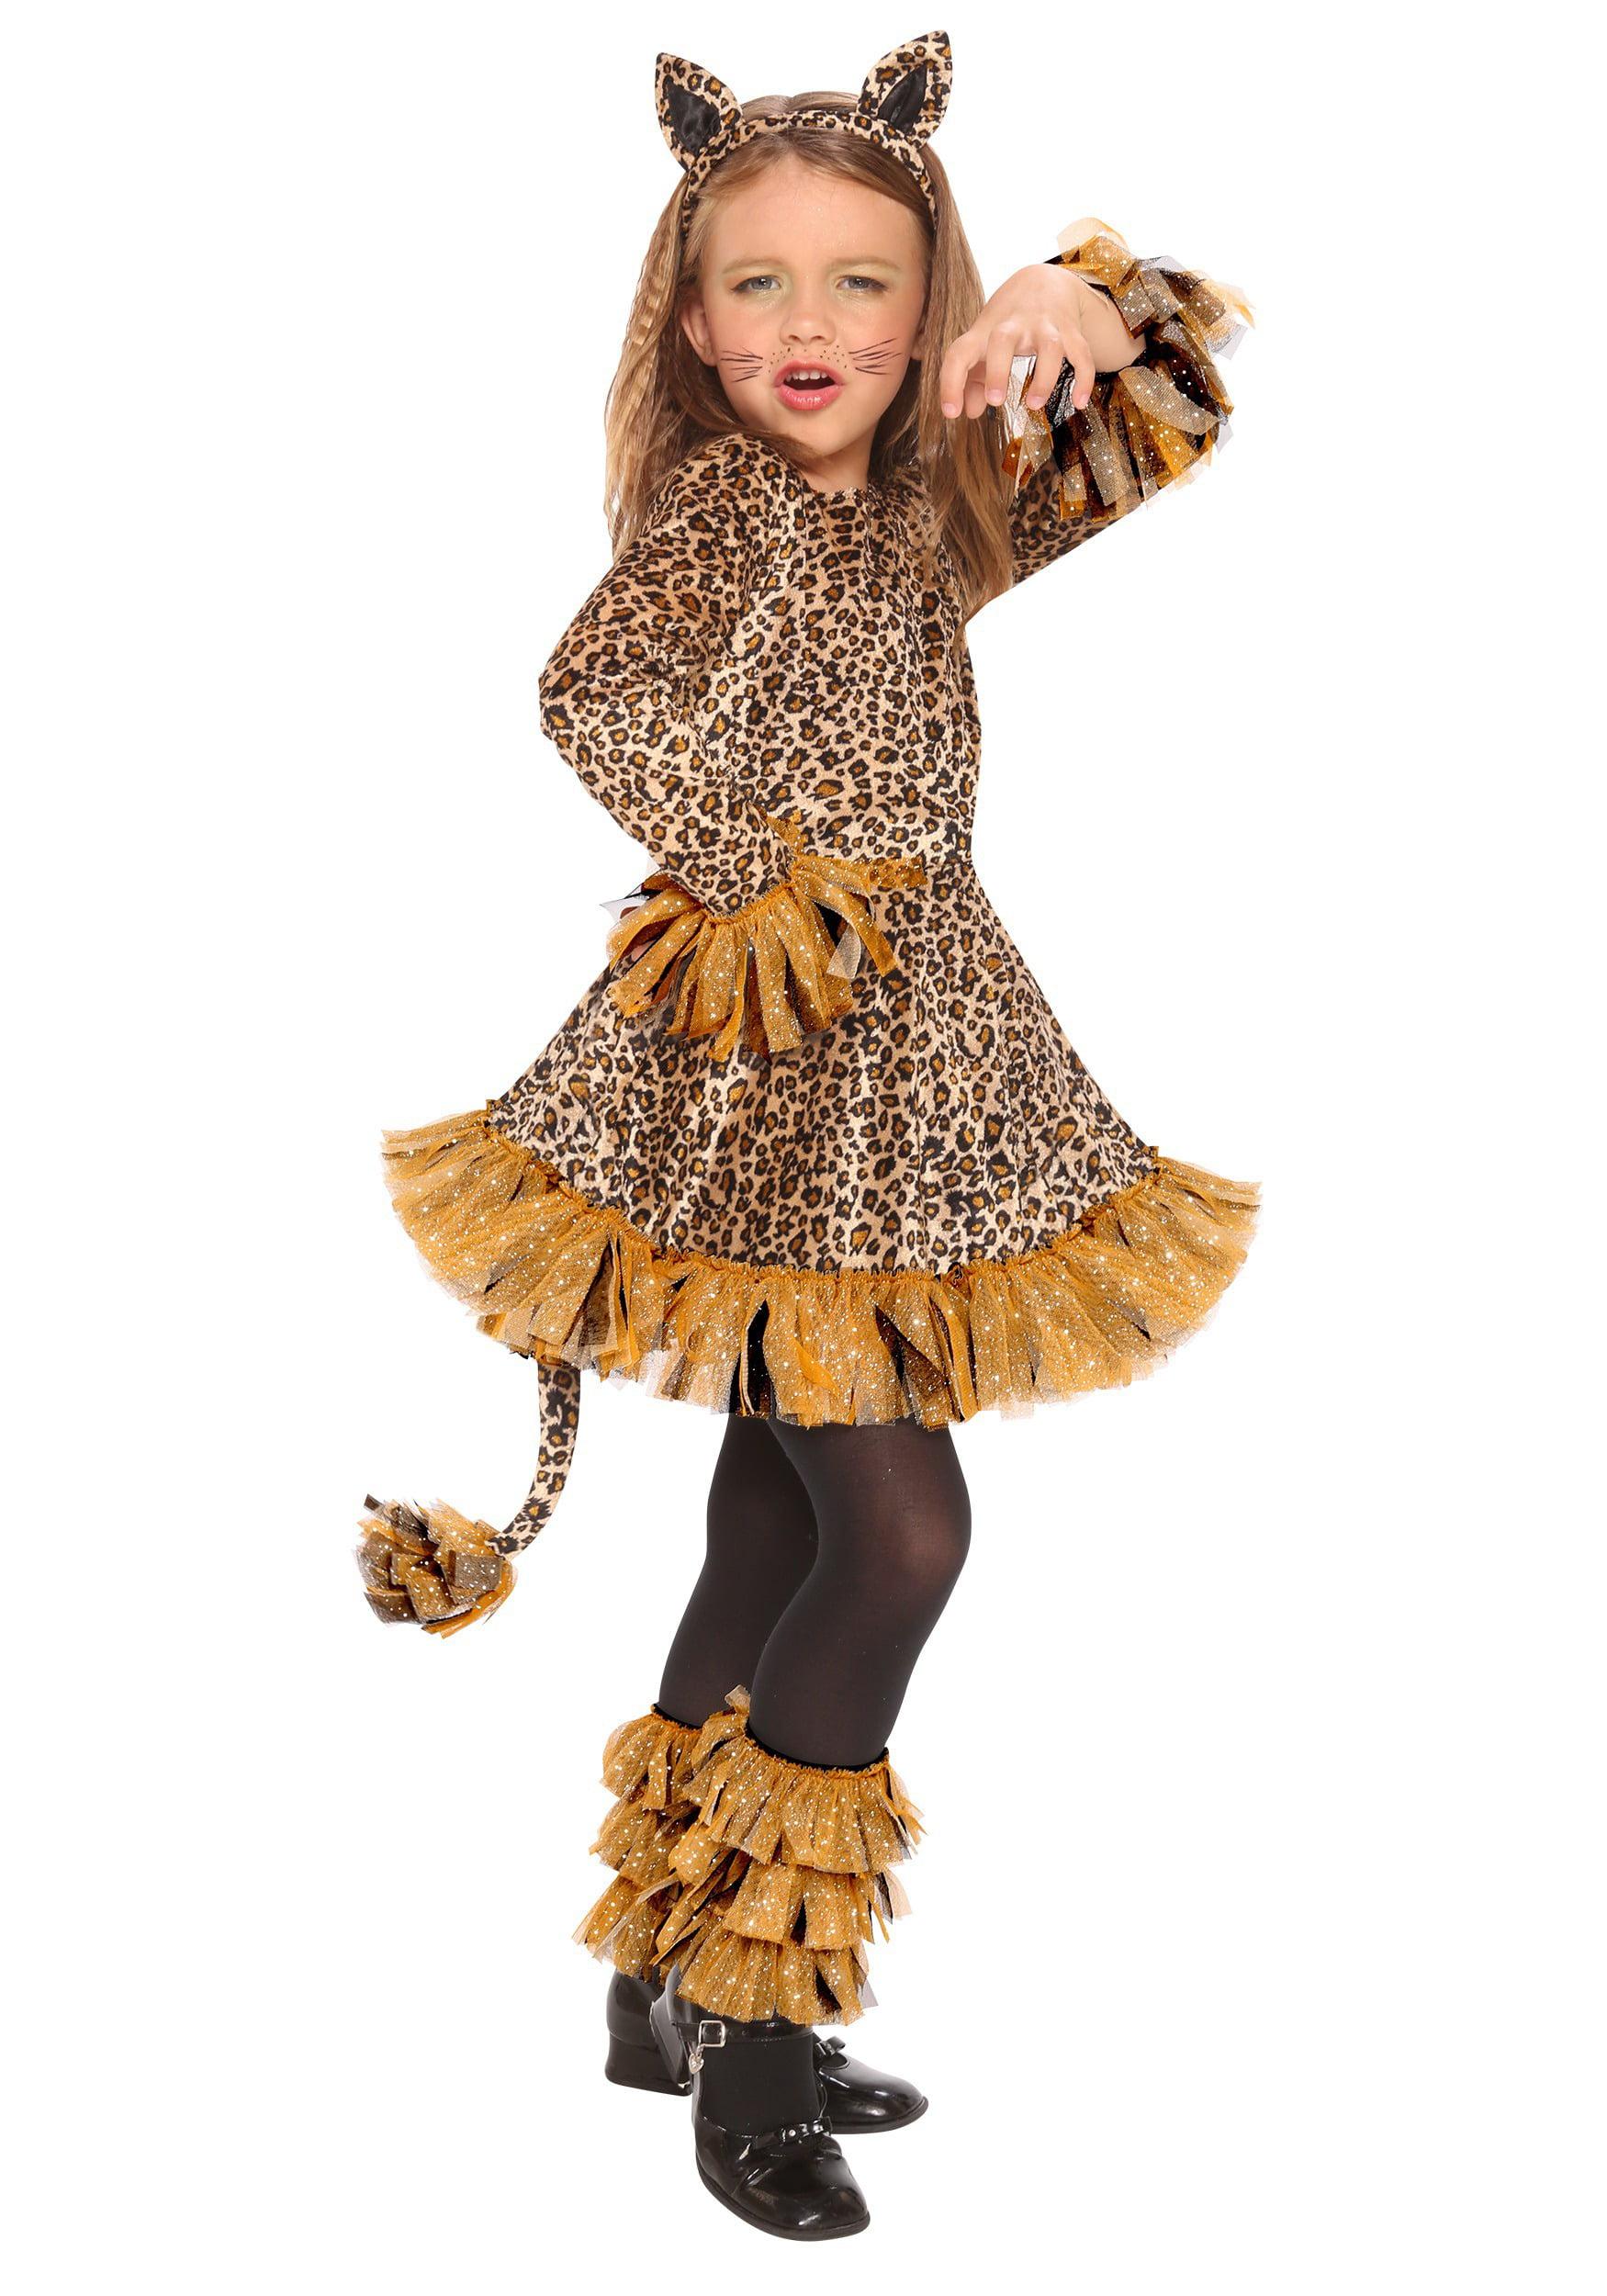 34f6b183024f Adorable Girls Leopard Print Velvety Costume Dress Glitter Wild Child Small  4-6 - image zoomed image